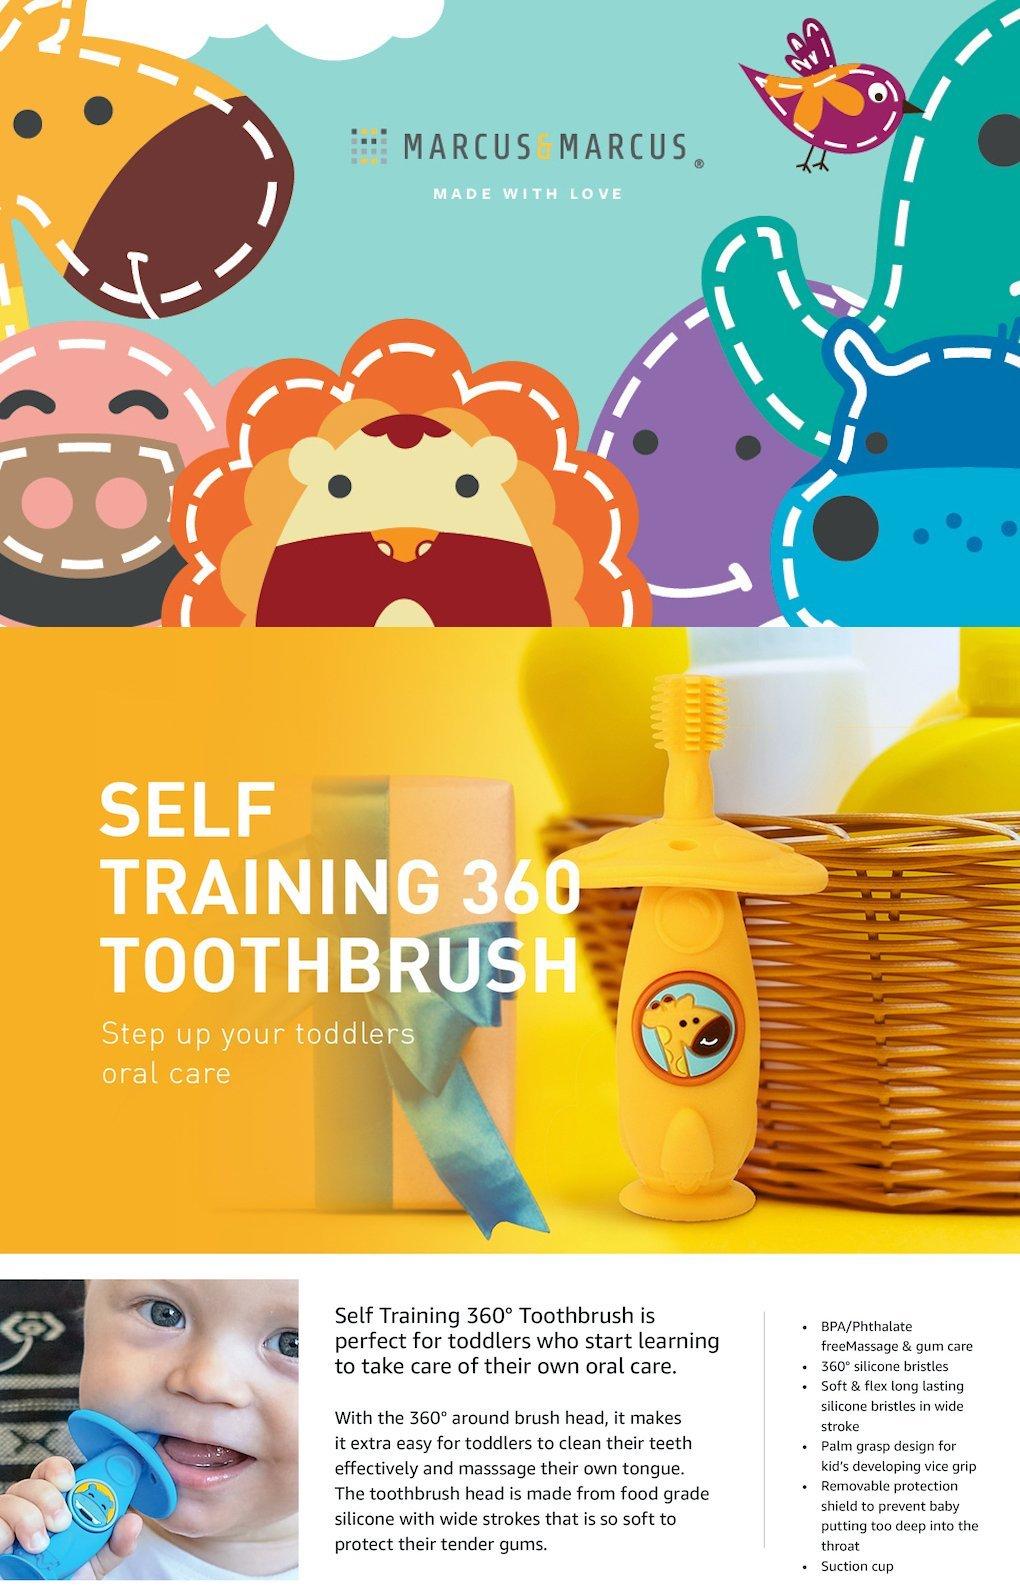 Self Training 360 Toothbrush